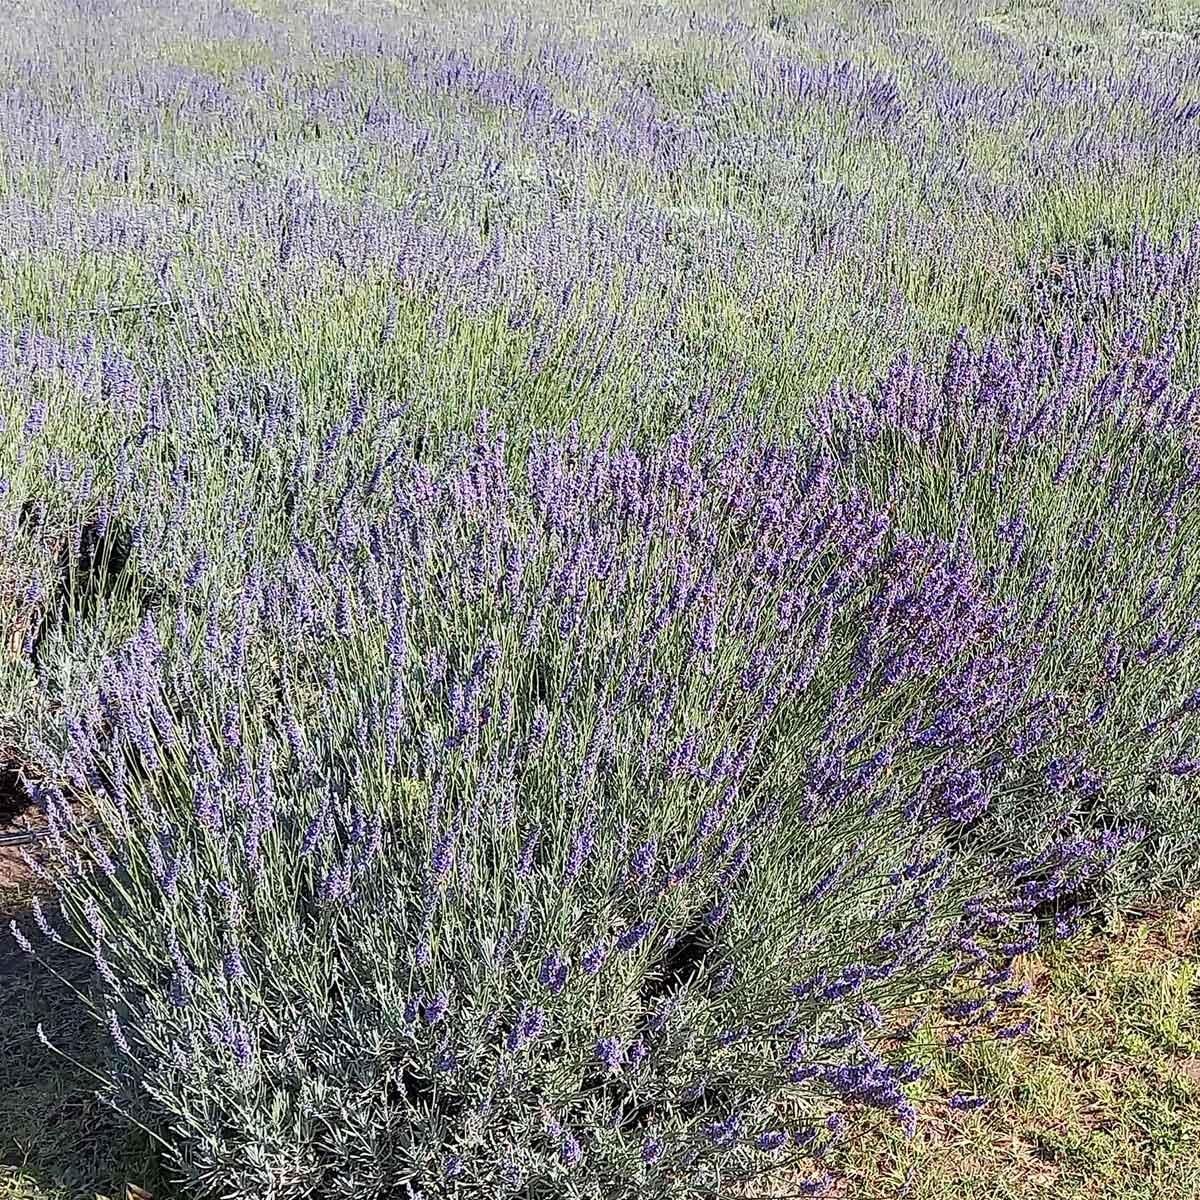 Cultivo de lavándulas: un rincón fragante en La Cumbre (Córdoba, Argentina)